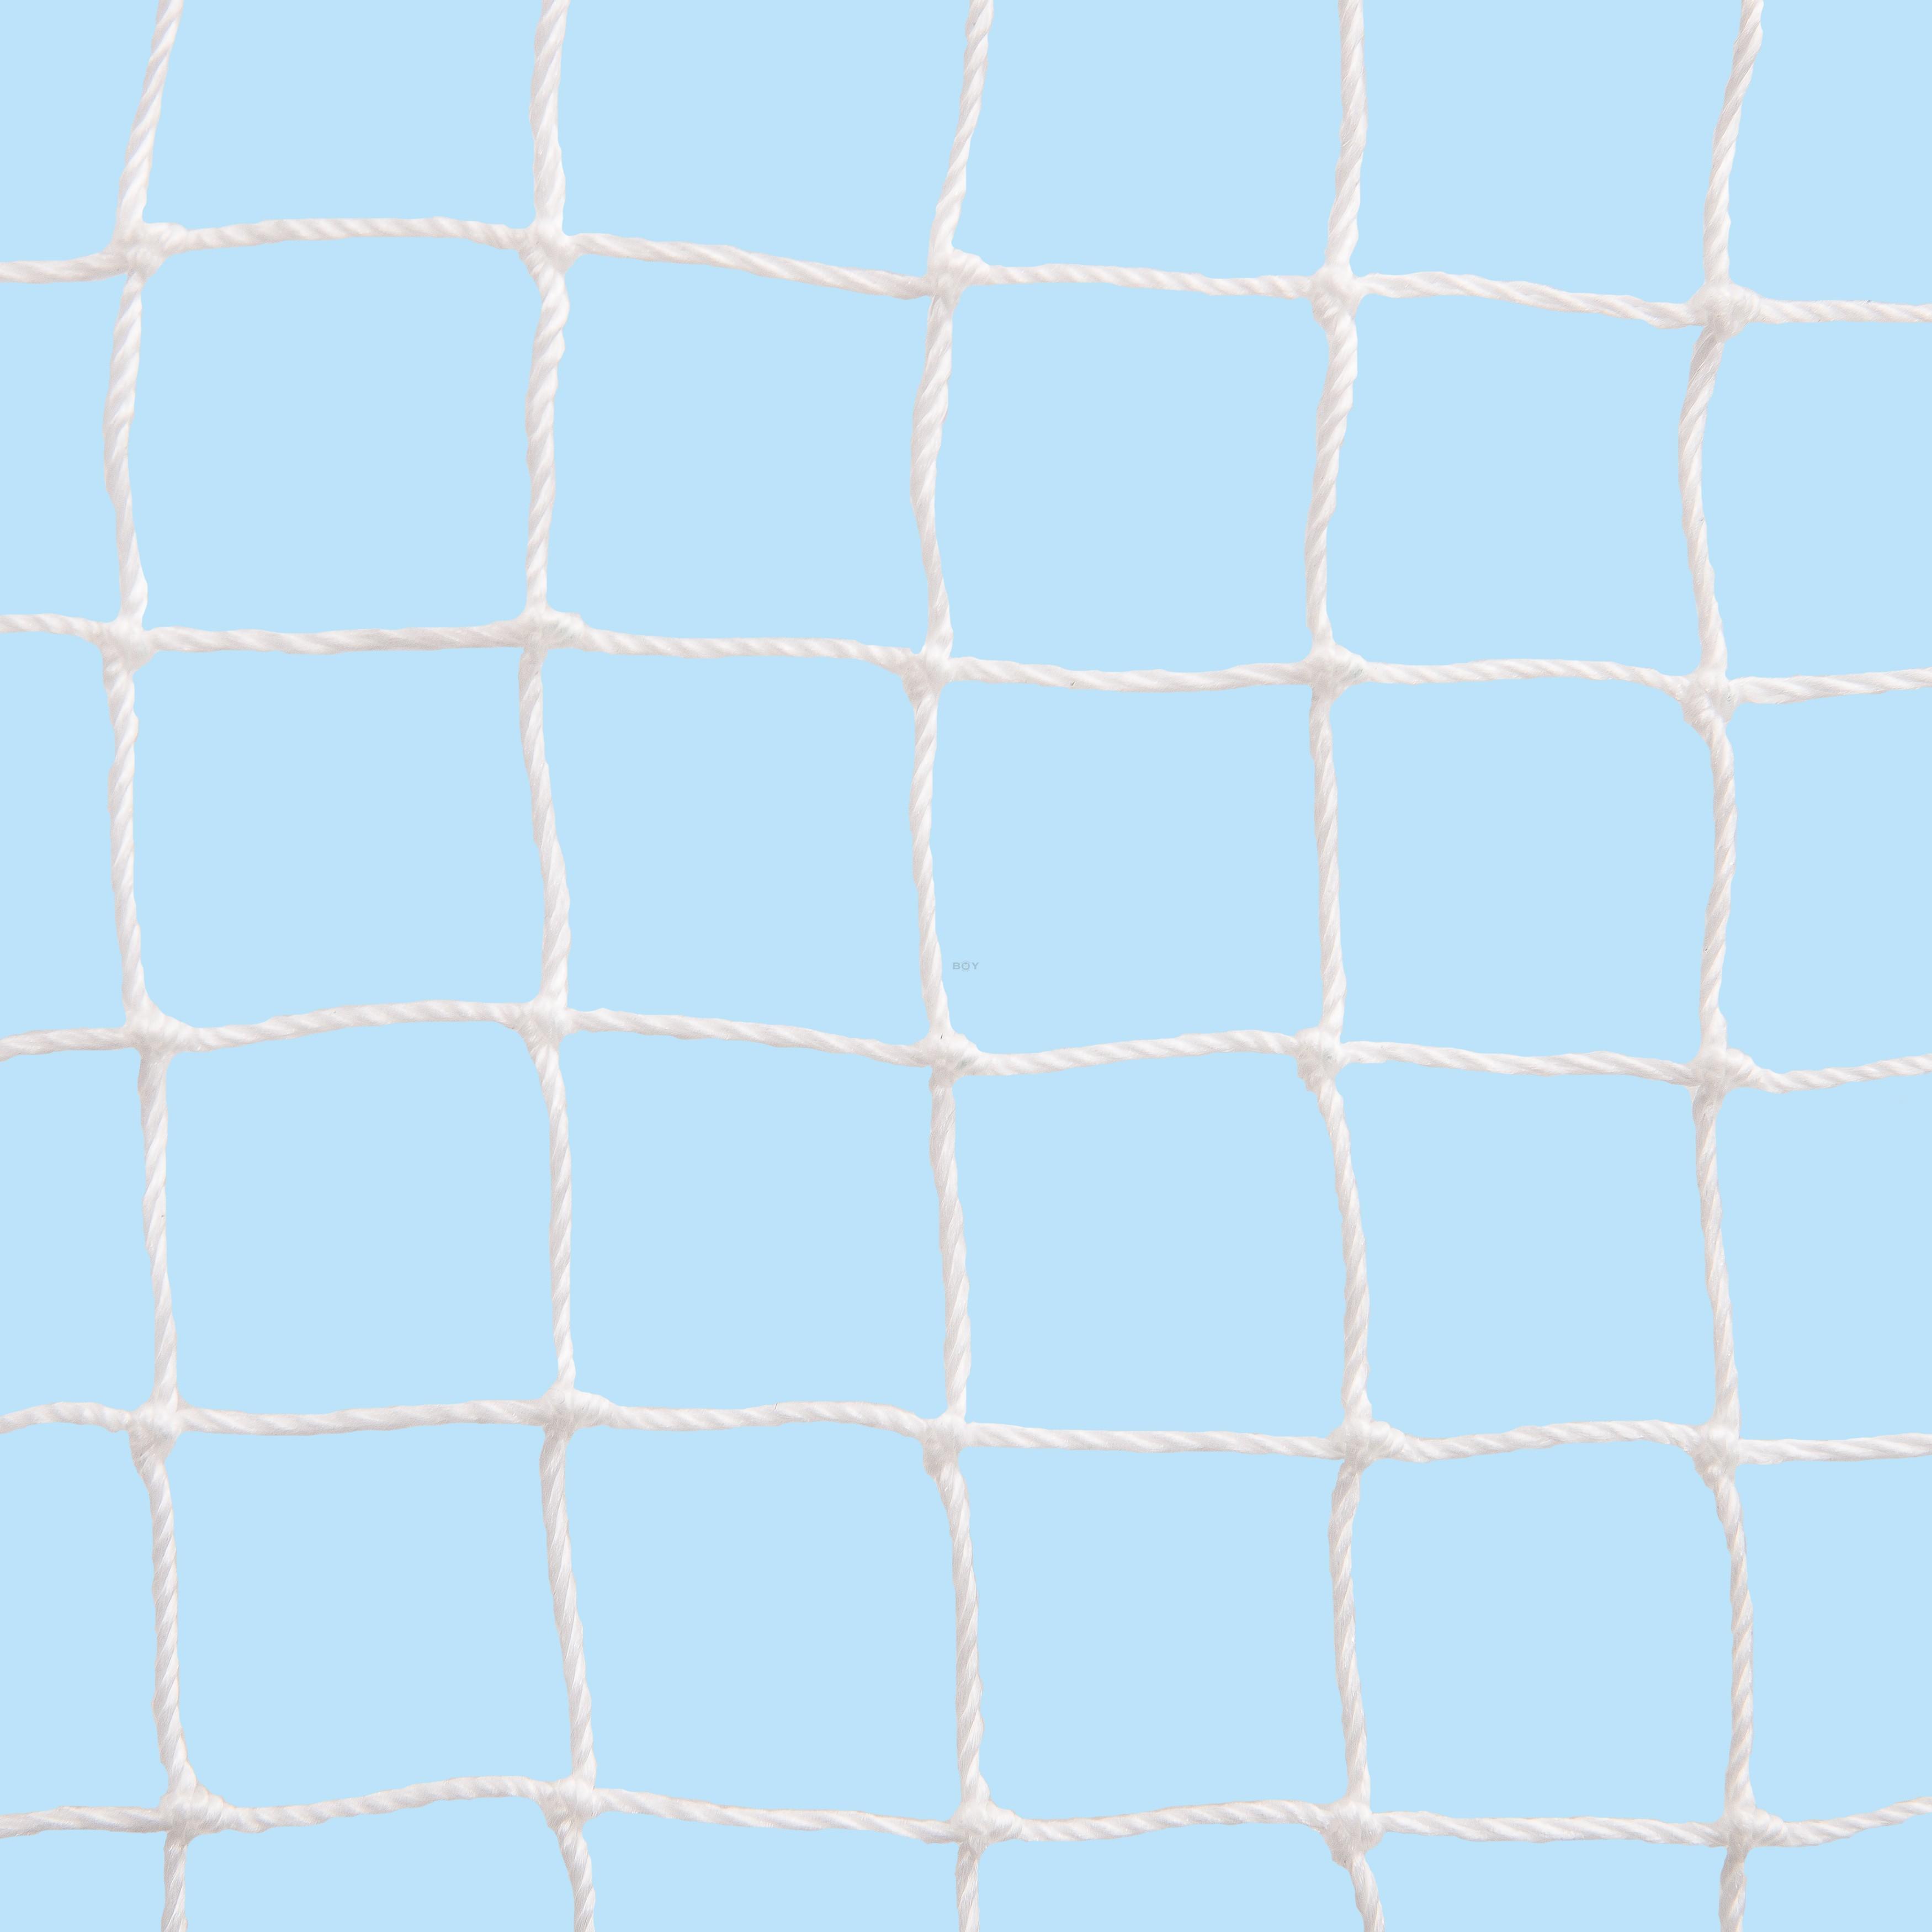 Balcony Cat Net in 20mm mesh, 1.2mm yarn Ø, olive green & white